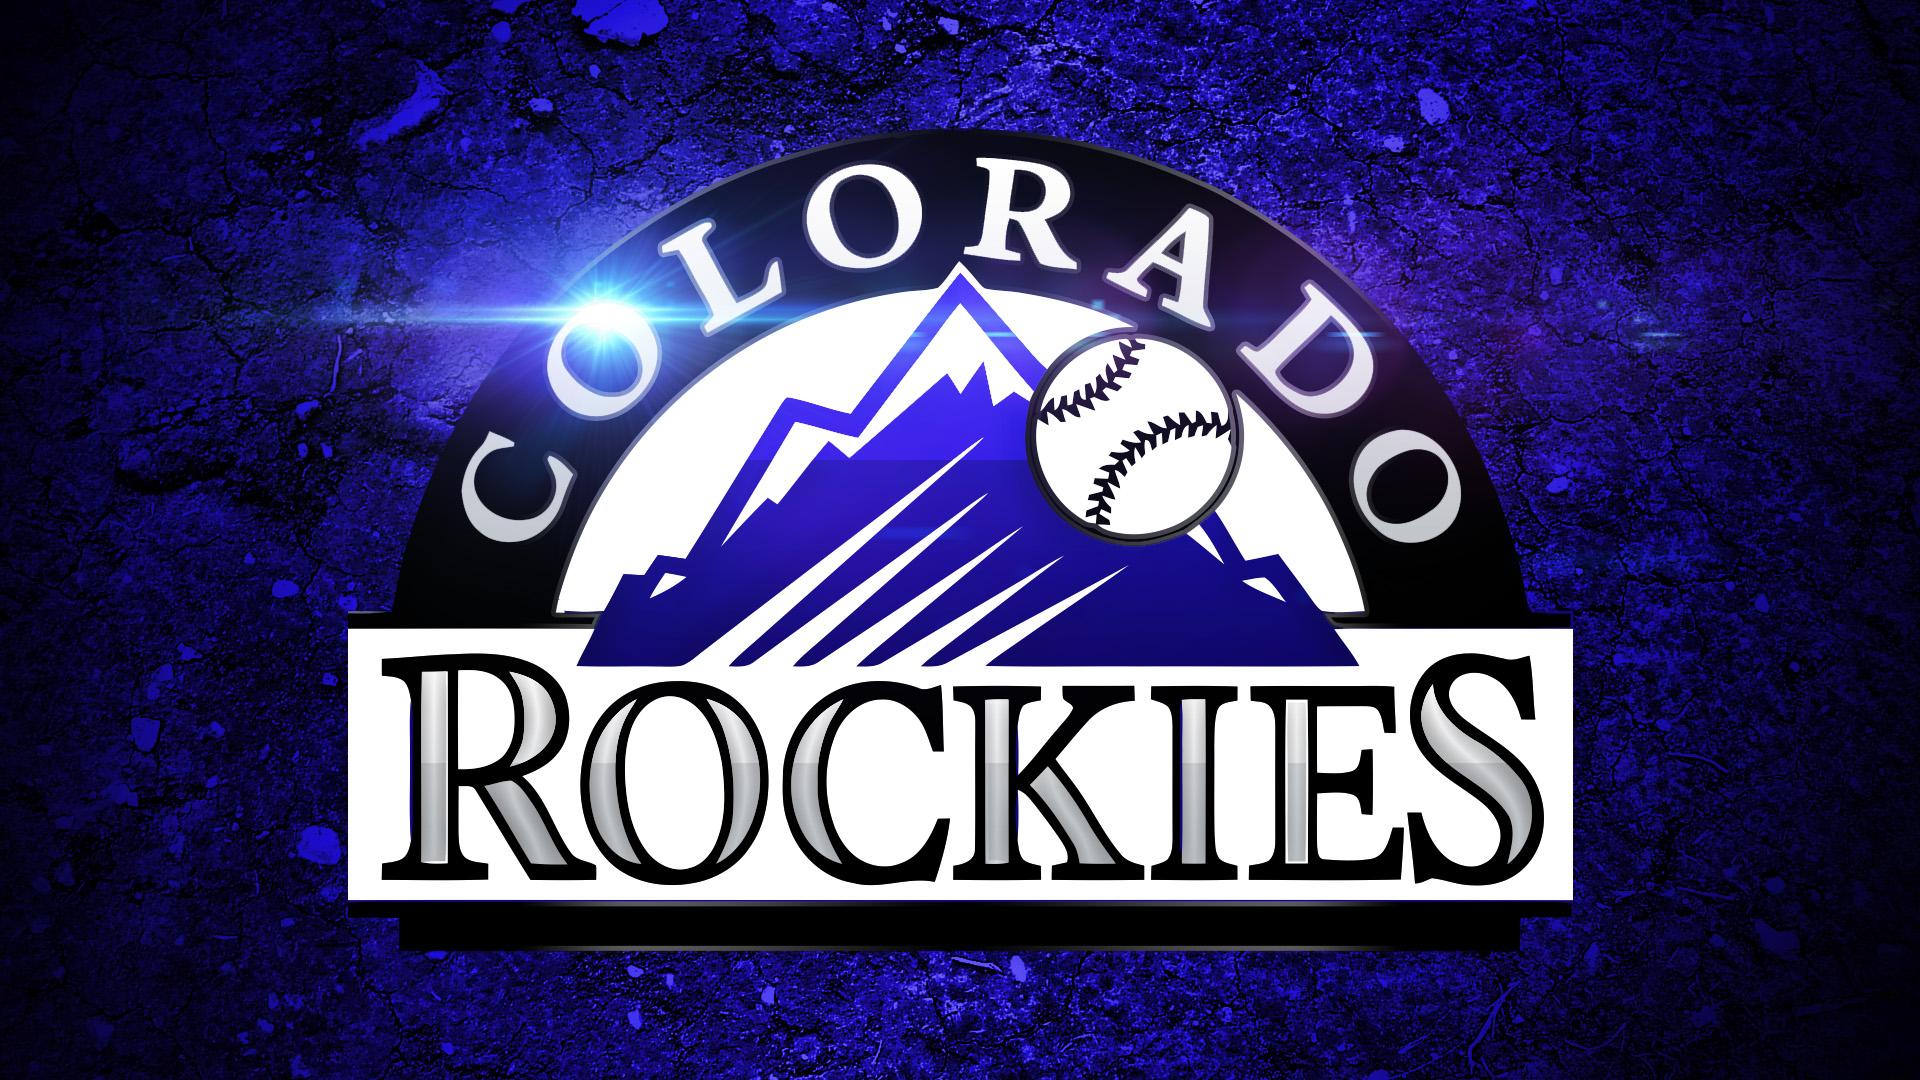 COLORADO ROCKIES baseball mlb 41 wallpaper 1920x1080 227969 1920x1080